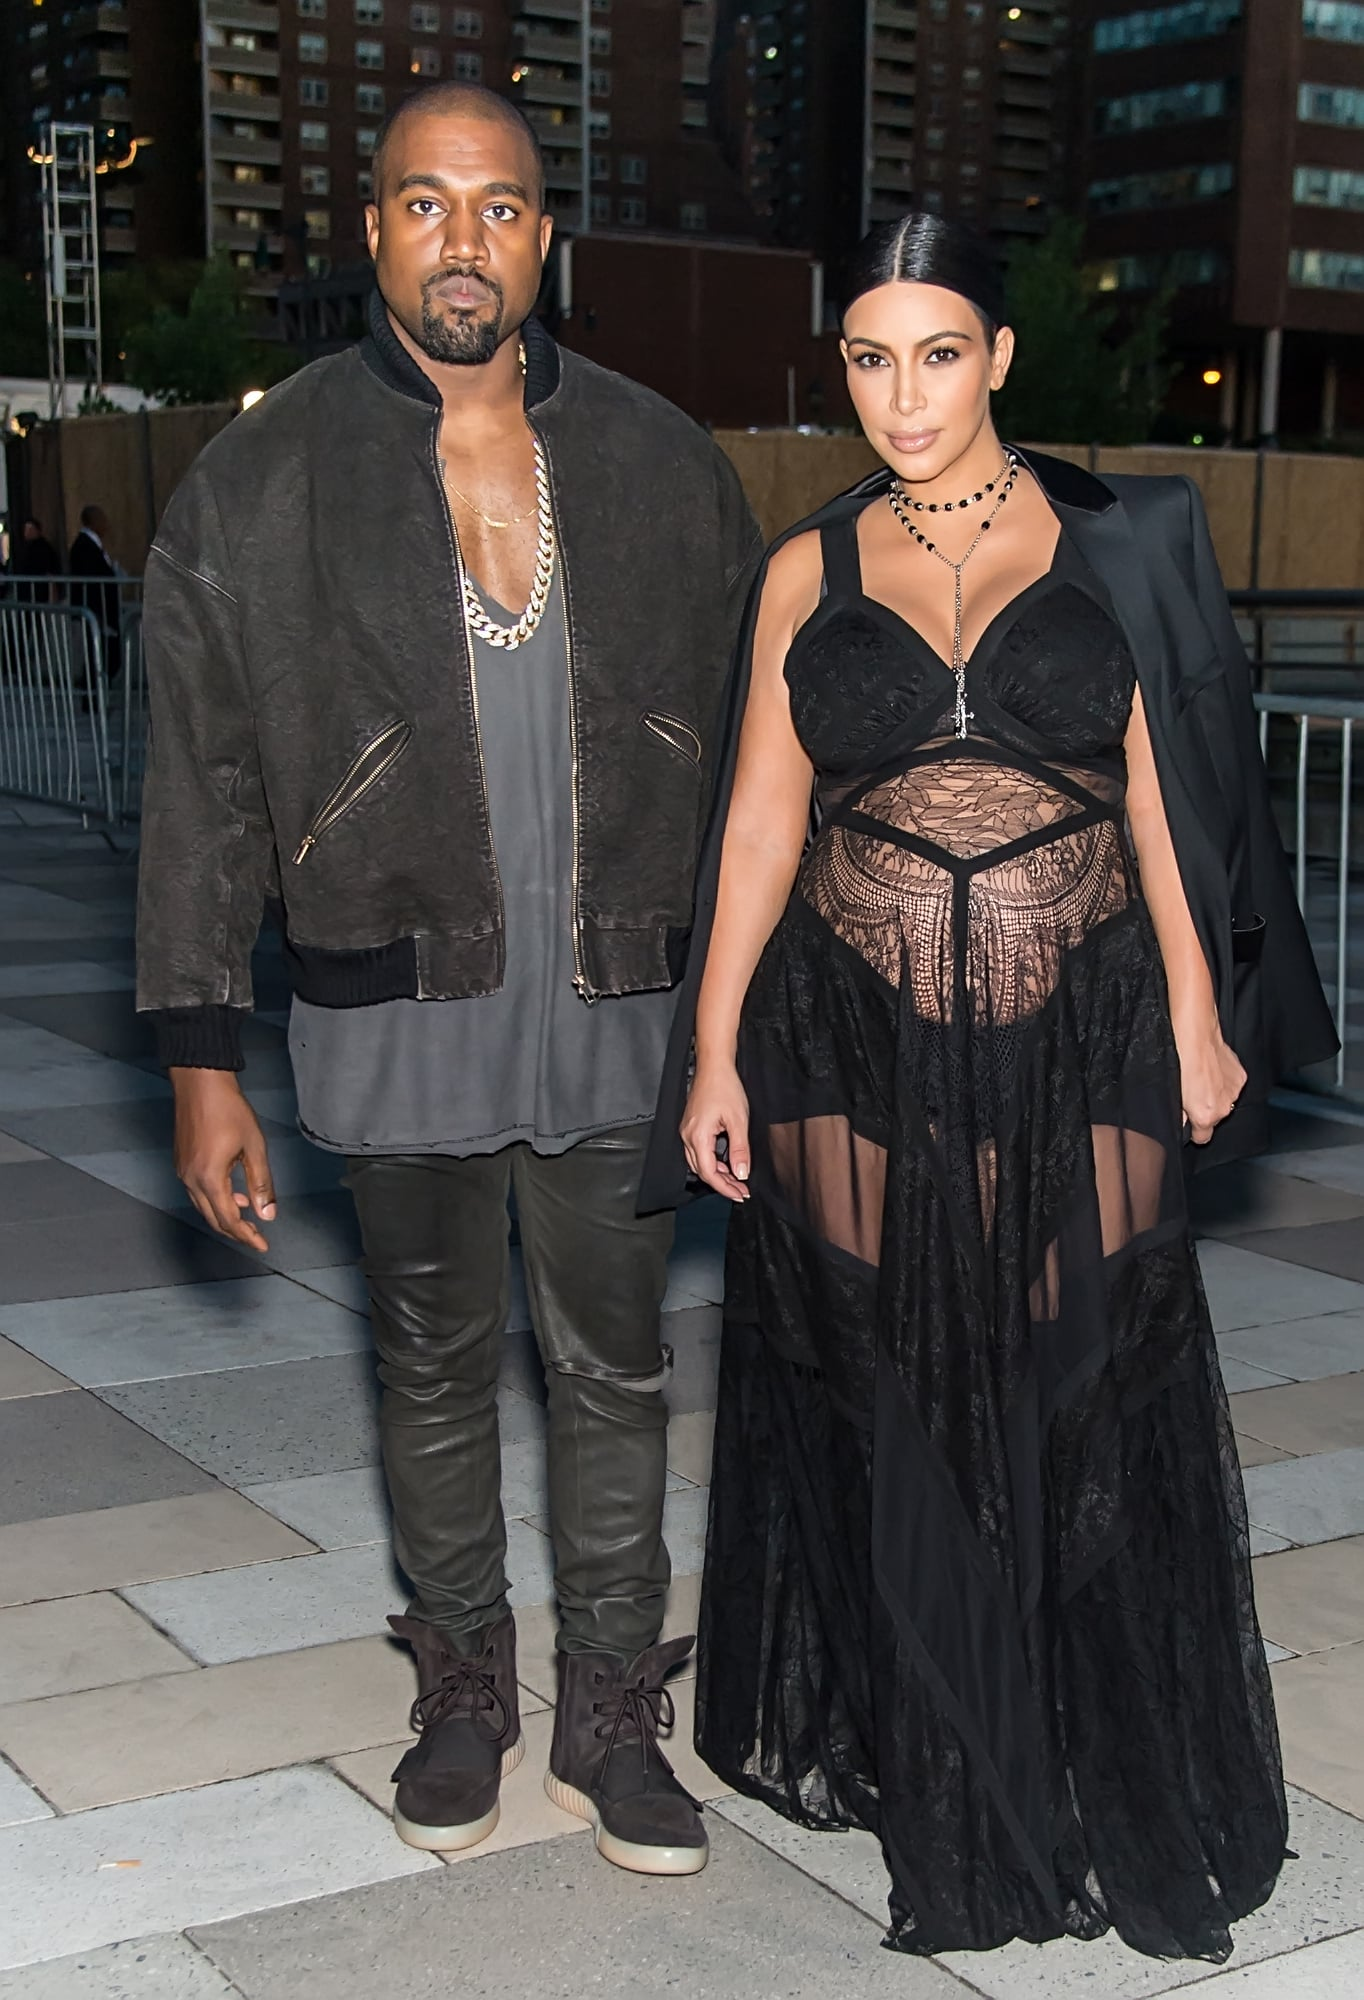 Kanye West Fashion Industry Discrimination Not Gay Popsugar Fashion